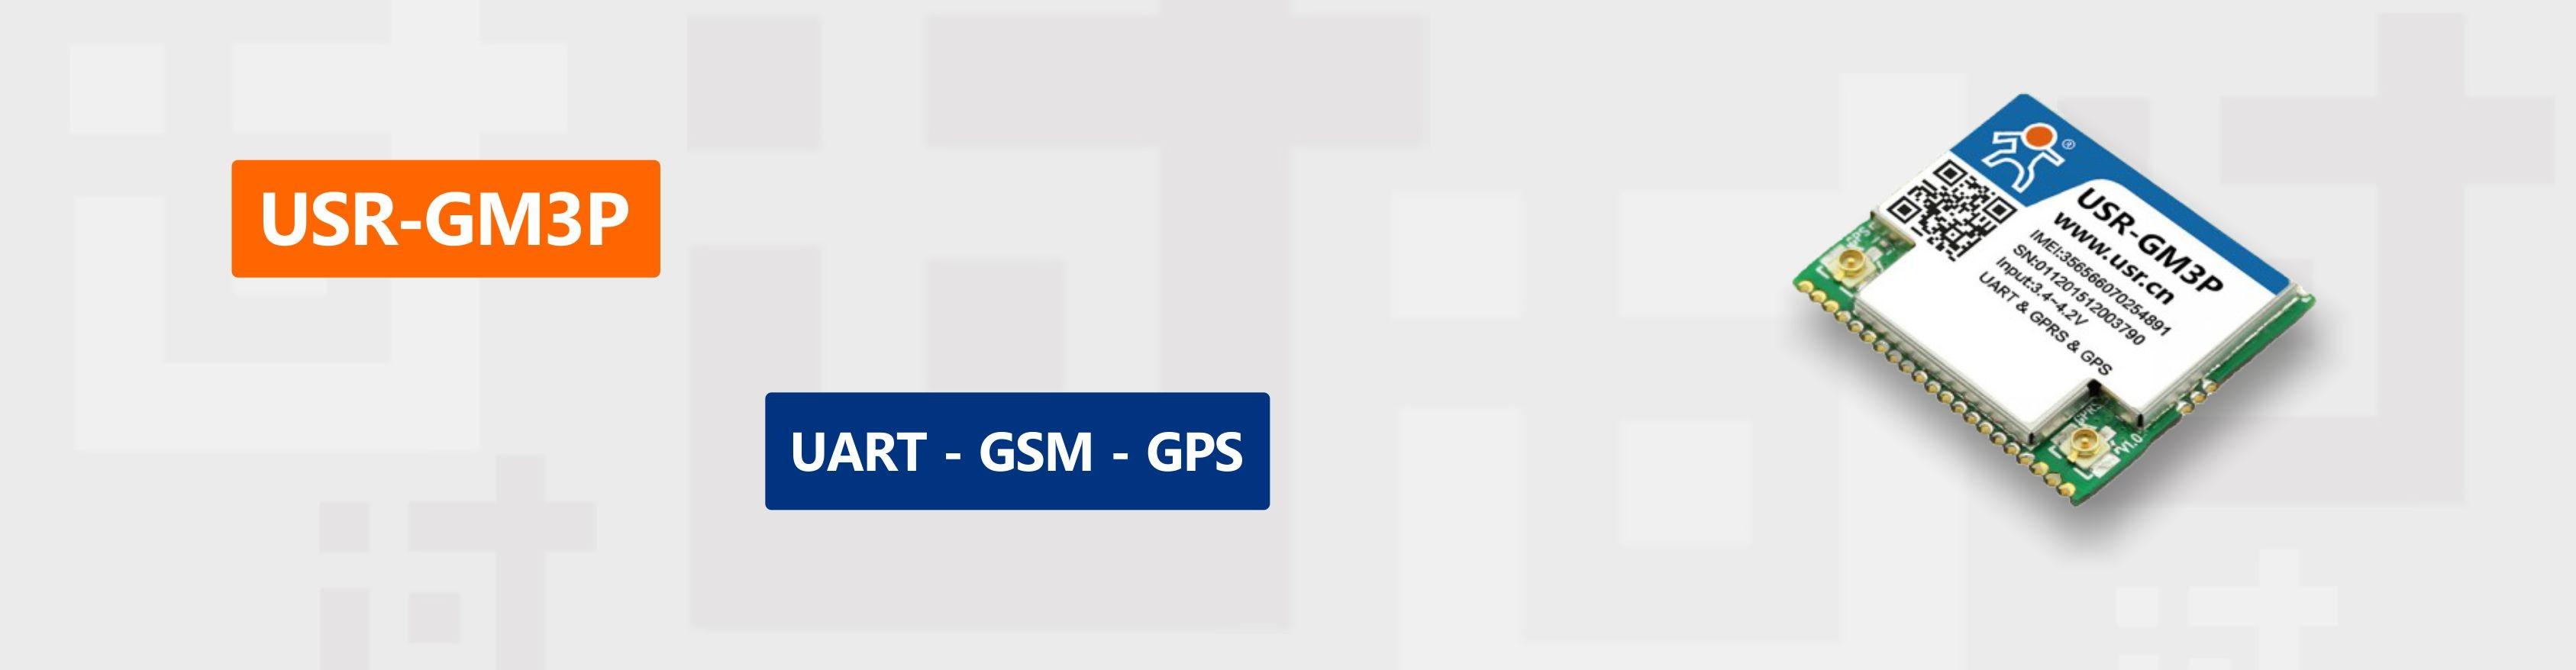 USR-GM3P